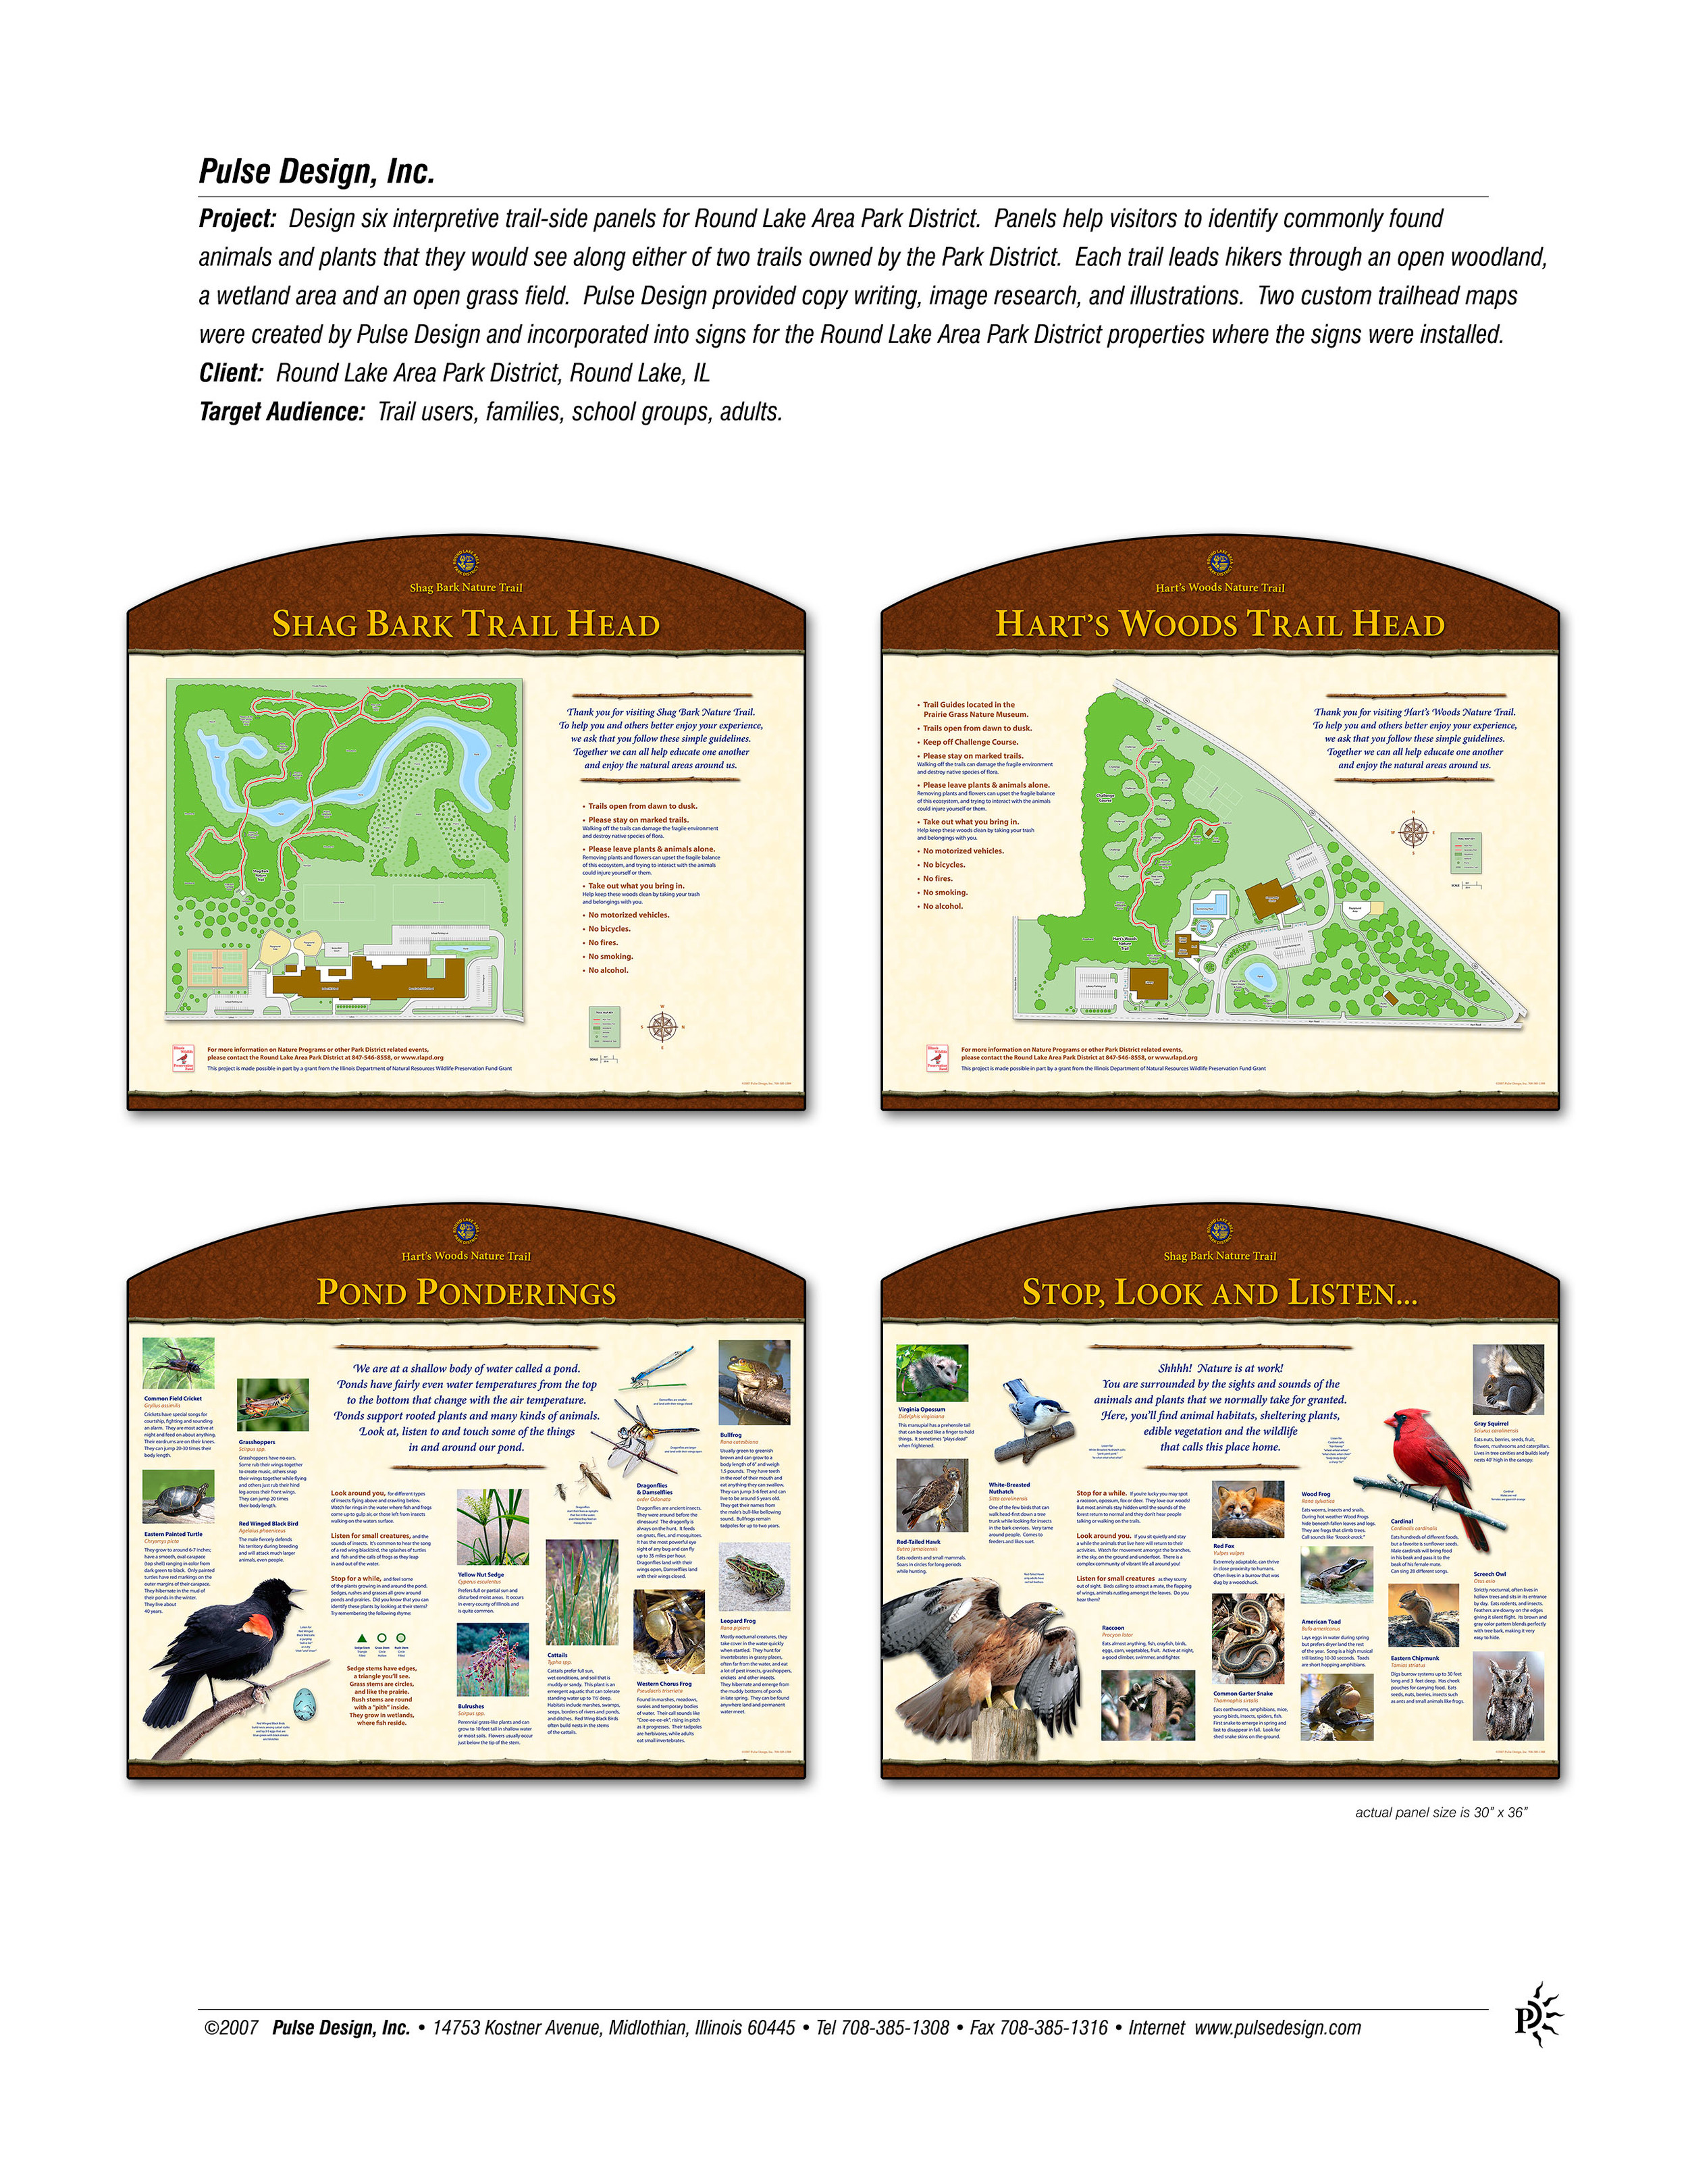 Round-Lake-Trail-Signs-Pulse-Design-Inc.jpg